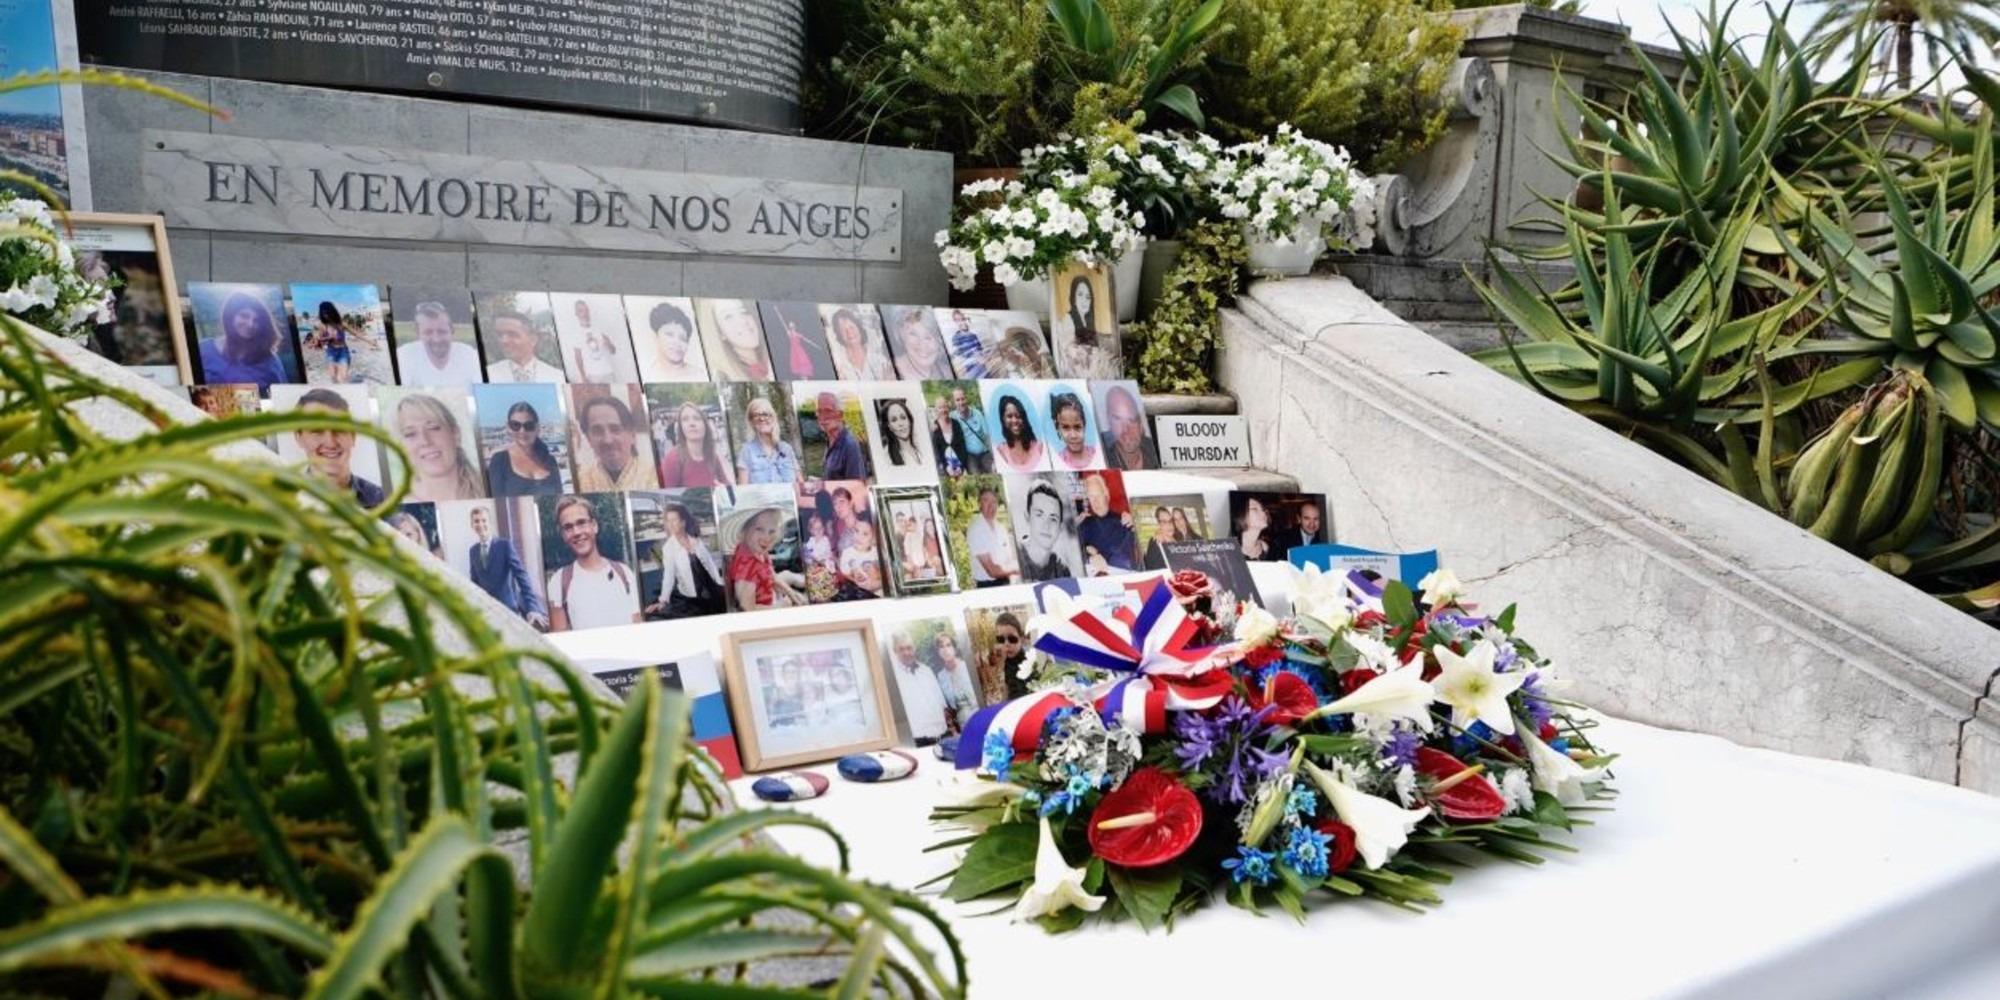 Attentat de Nice en 2016 : arrestation en Italie d'un complice de l'assaillant